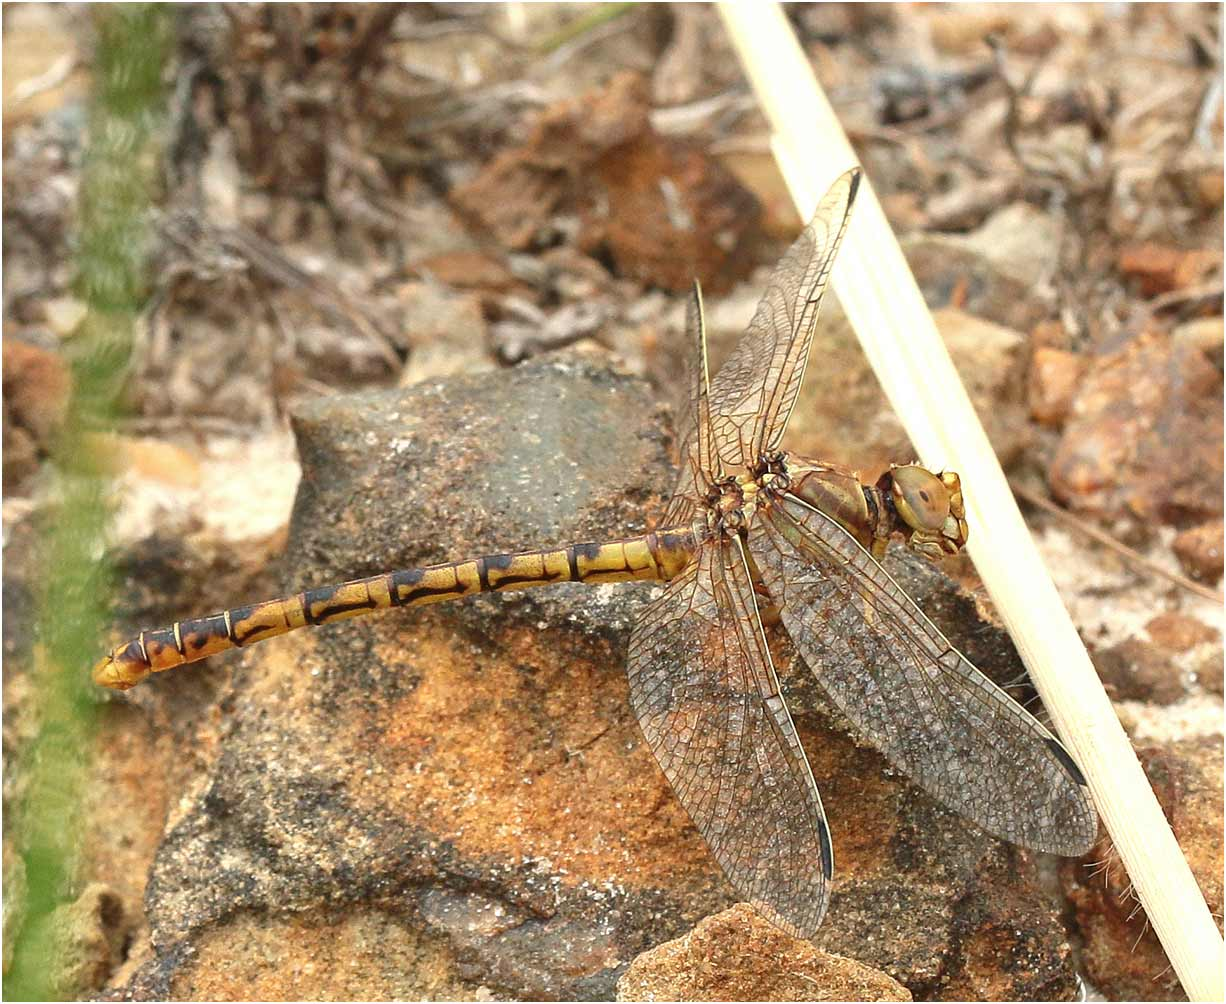 Crenigomphus cornutus, Namibie, Katima Mulilo, rapides du Zambèze, 17/02/2020